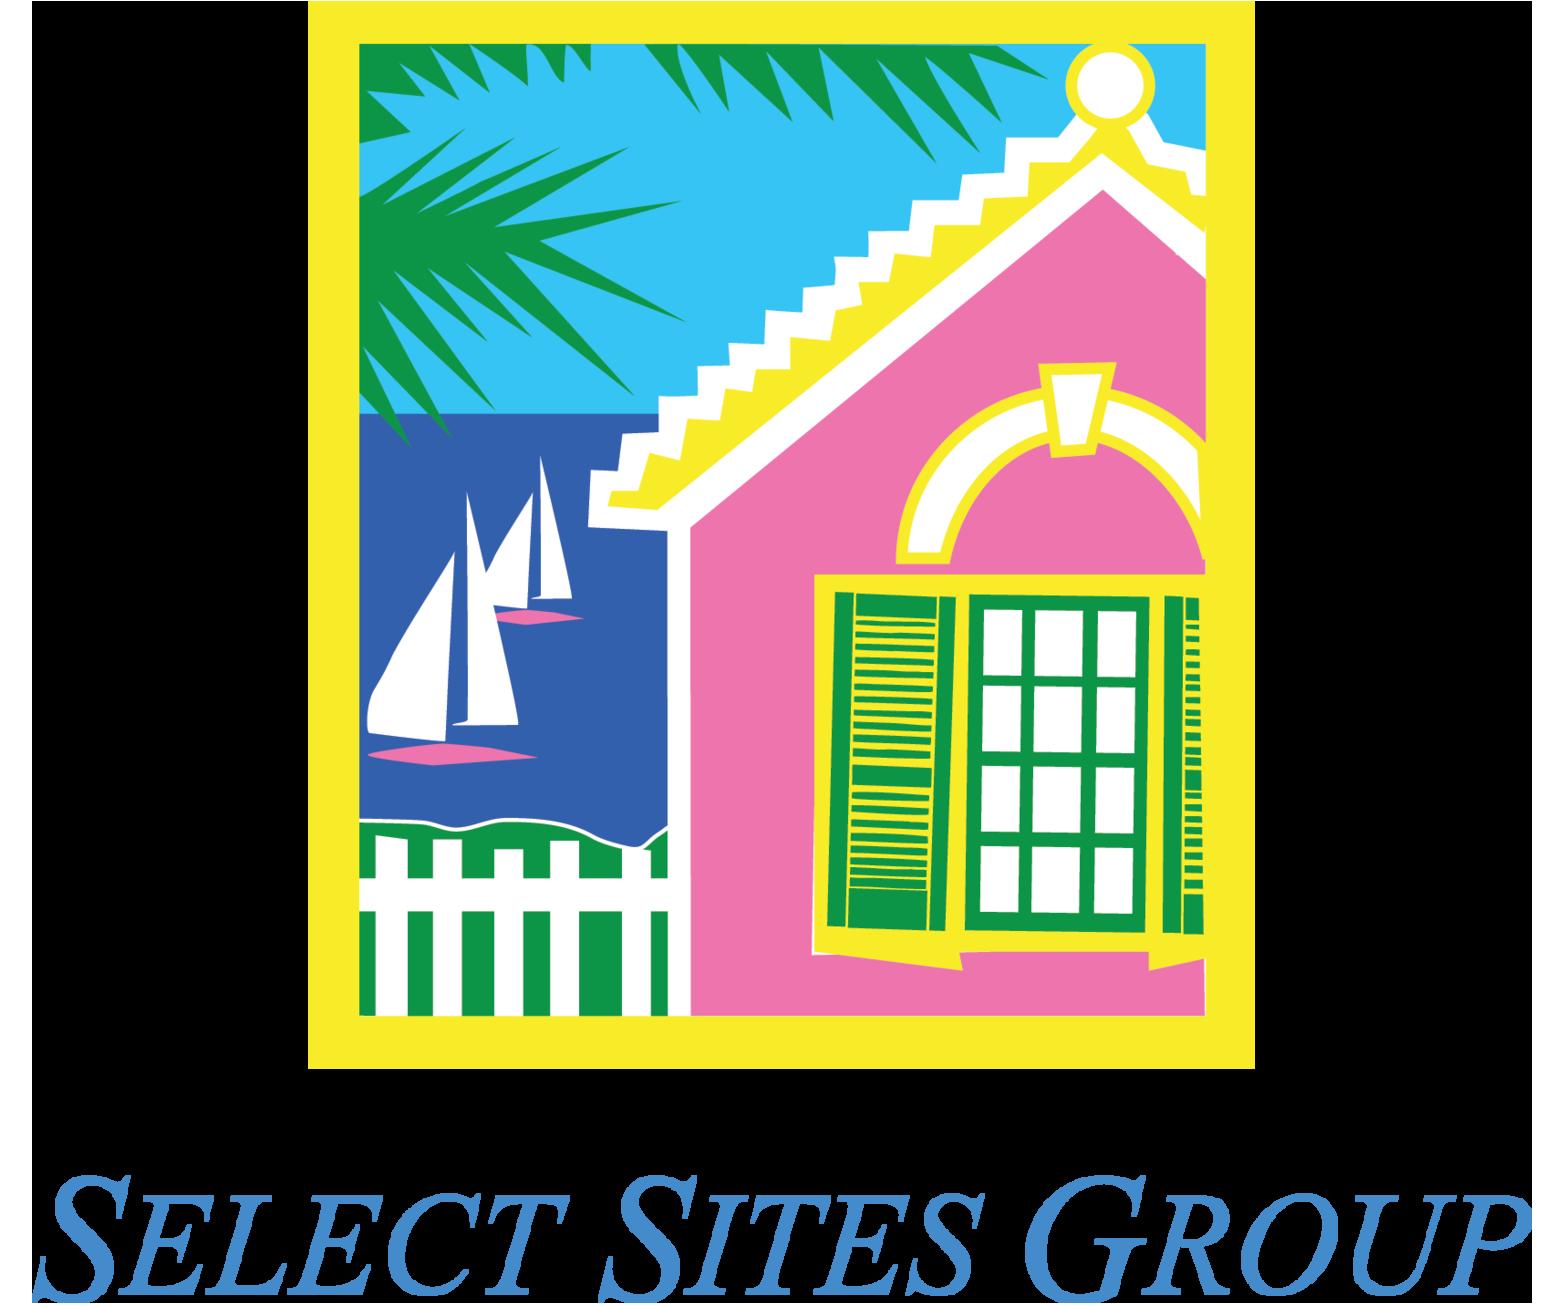 https://www.selectsitesgroup.com/